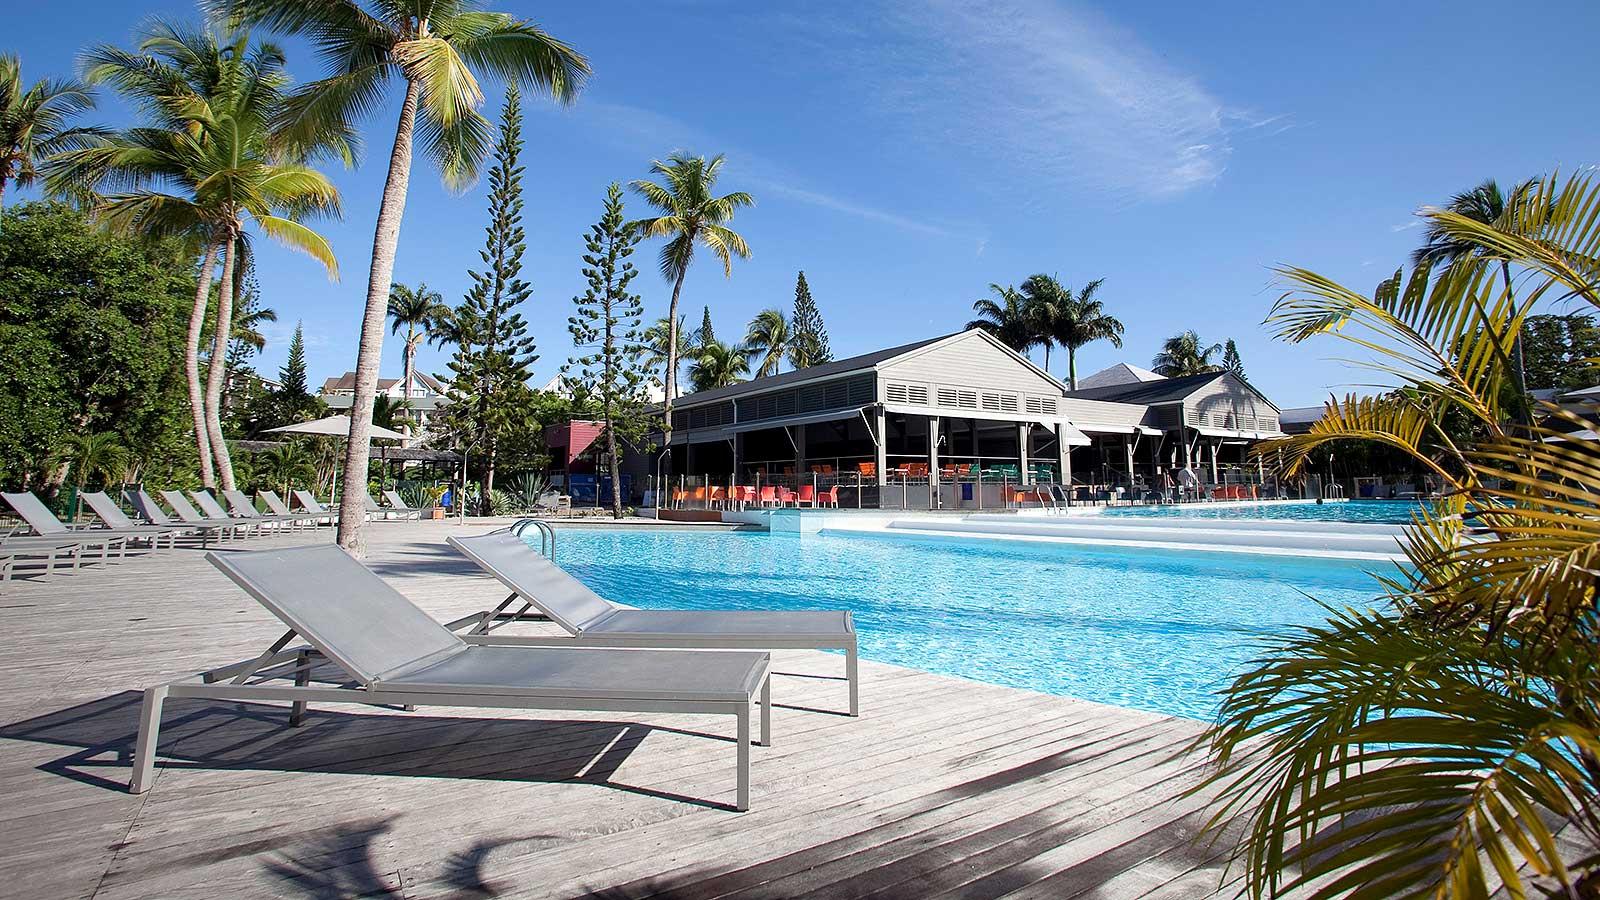 http://www.deshotelsetdesiles.com/hotel-vol-guadeloupe/photos/diapo-creole-piscine.jpg